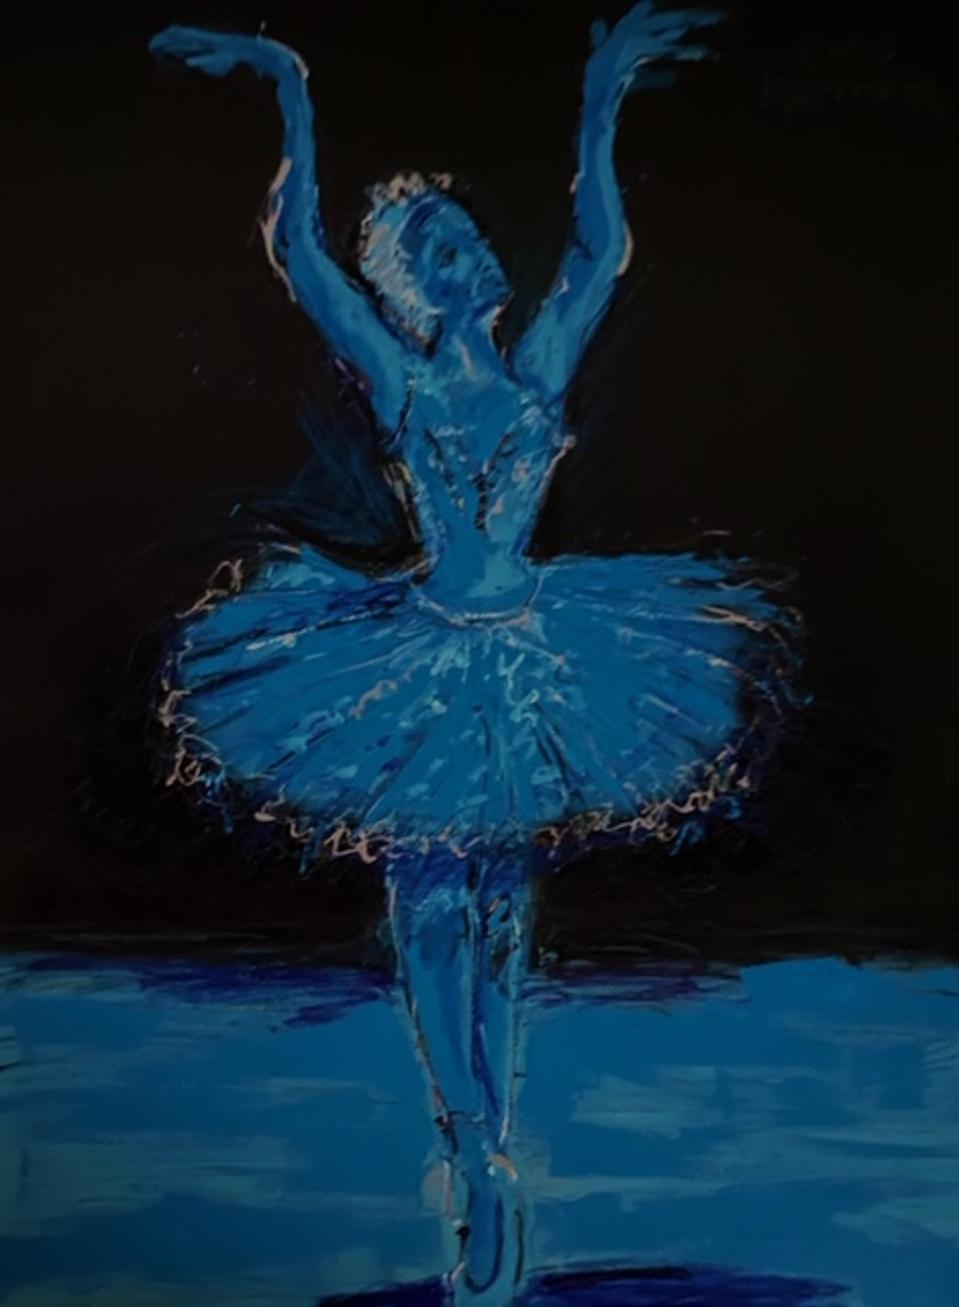 Chris Kappmeier Studio, art, ballerina, dance, tutu, Vincent van Gogh